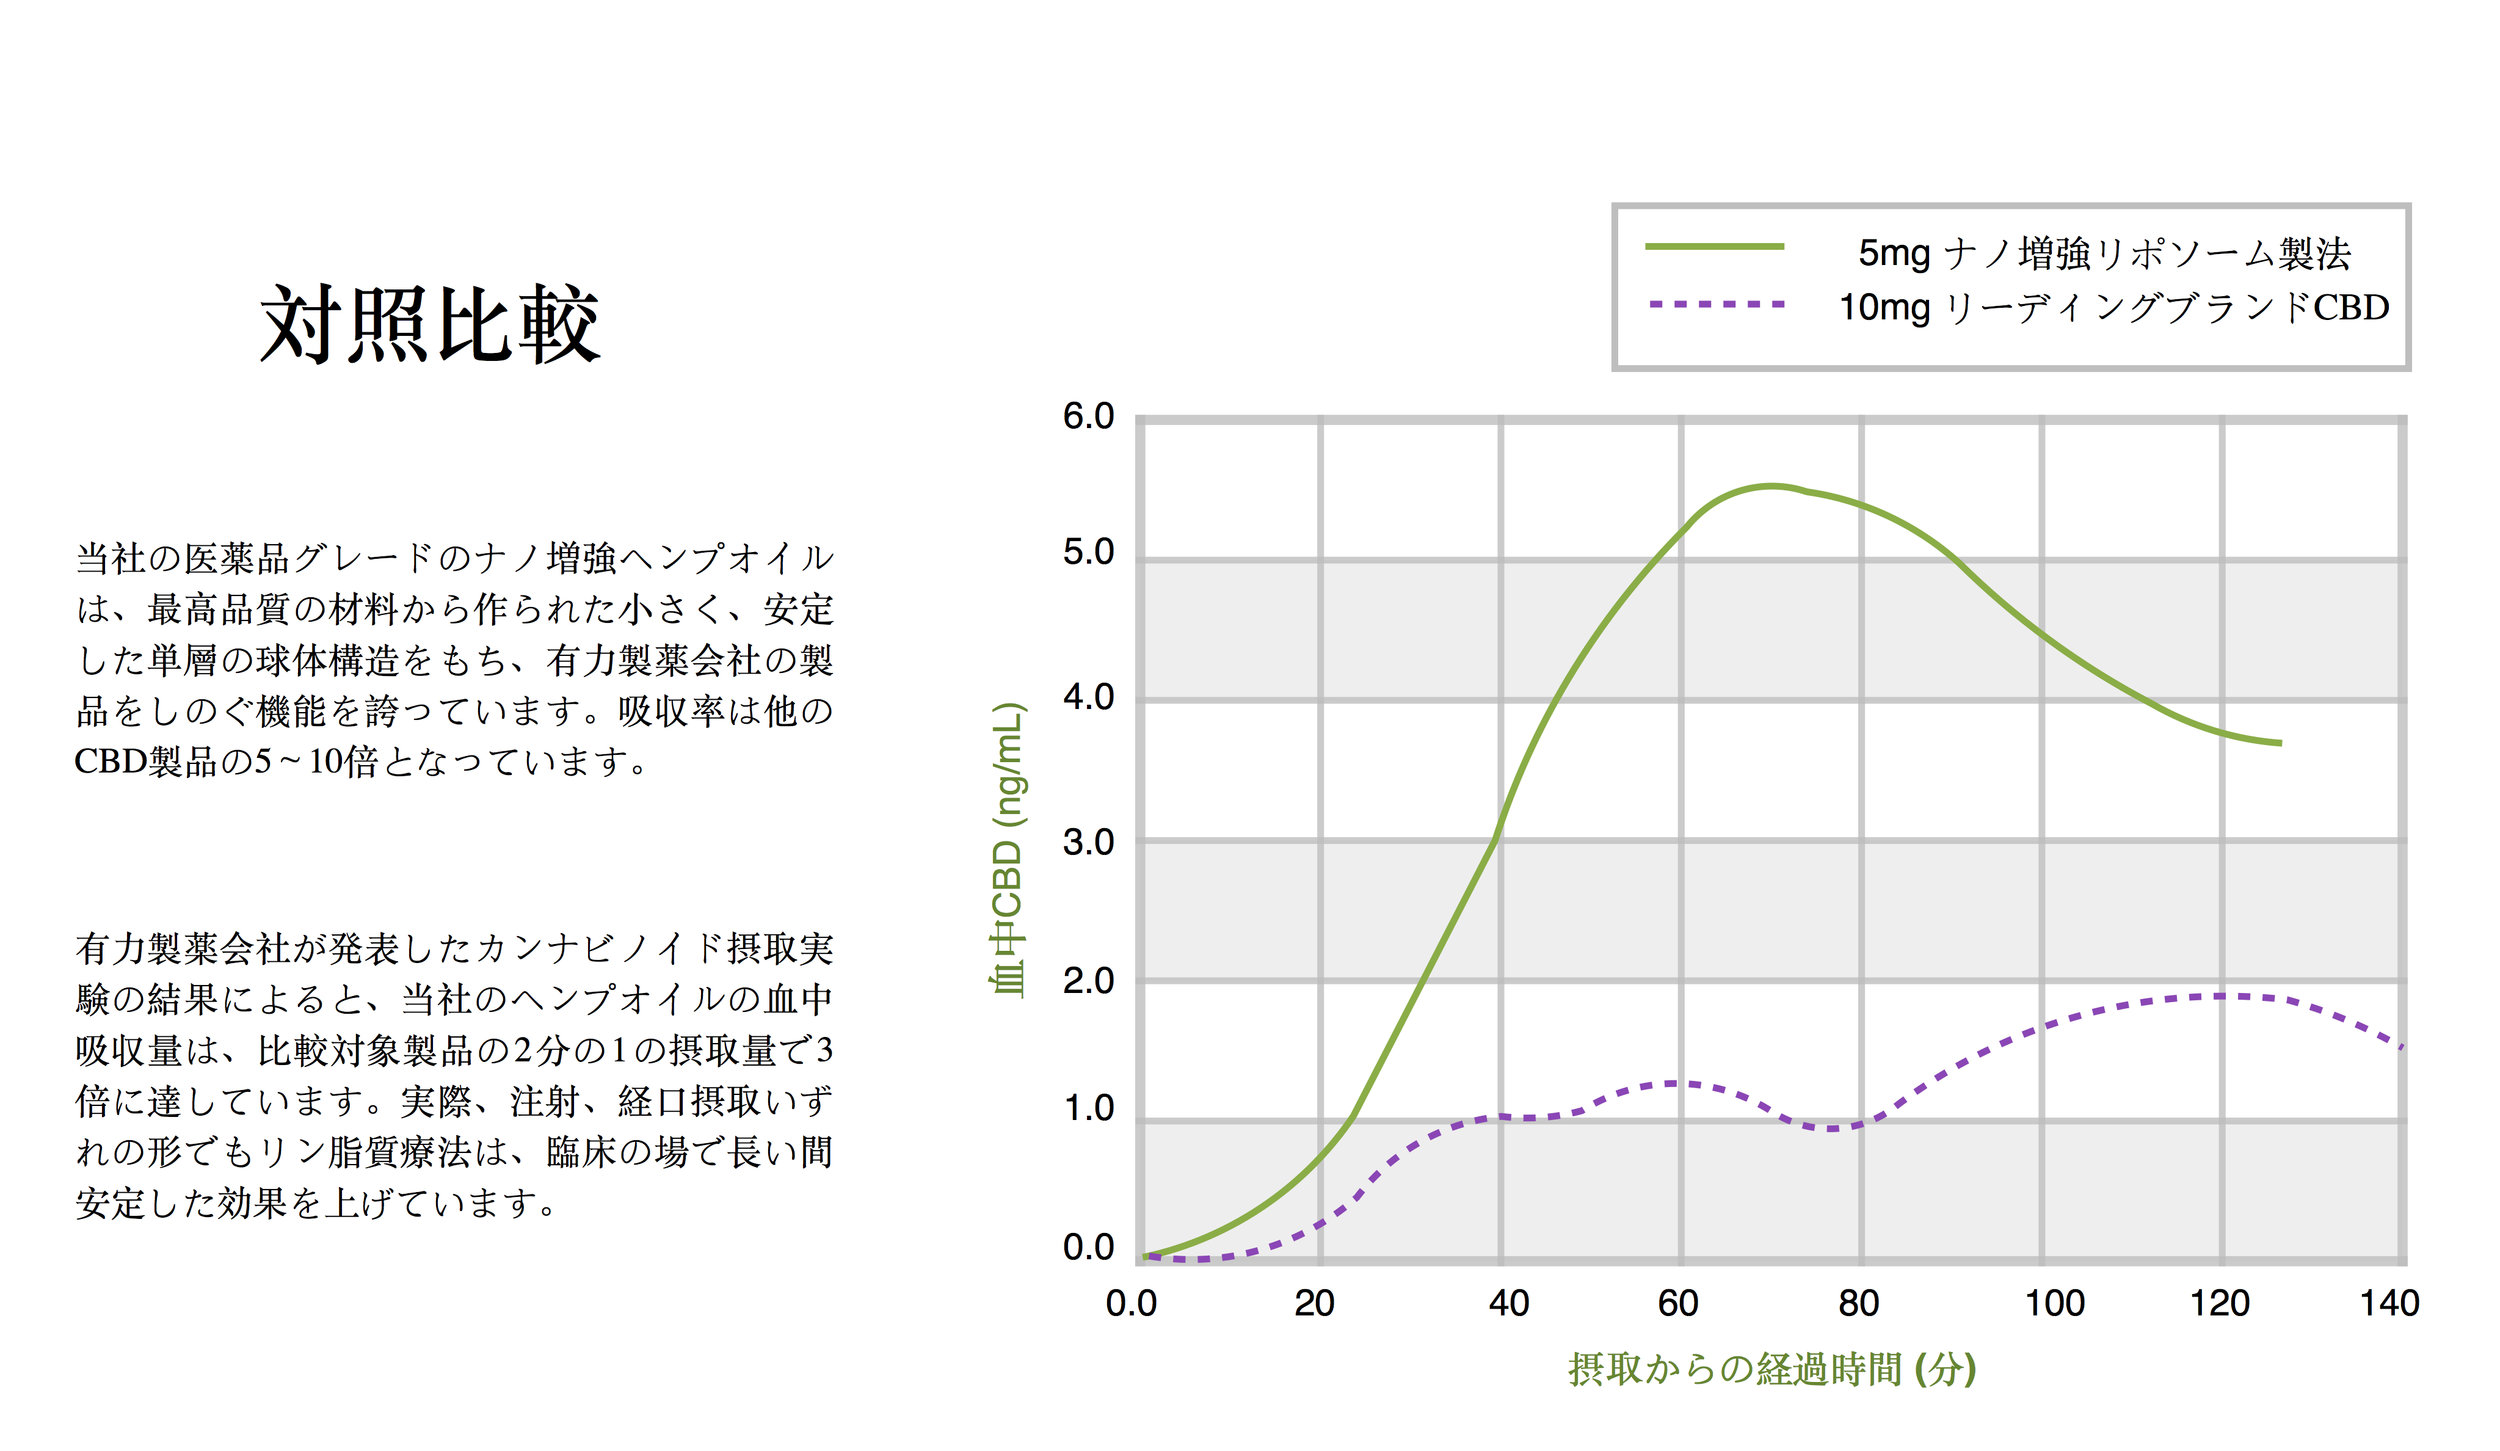 SidebySideJPN_JPG.jpg